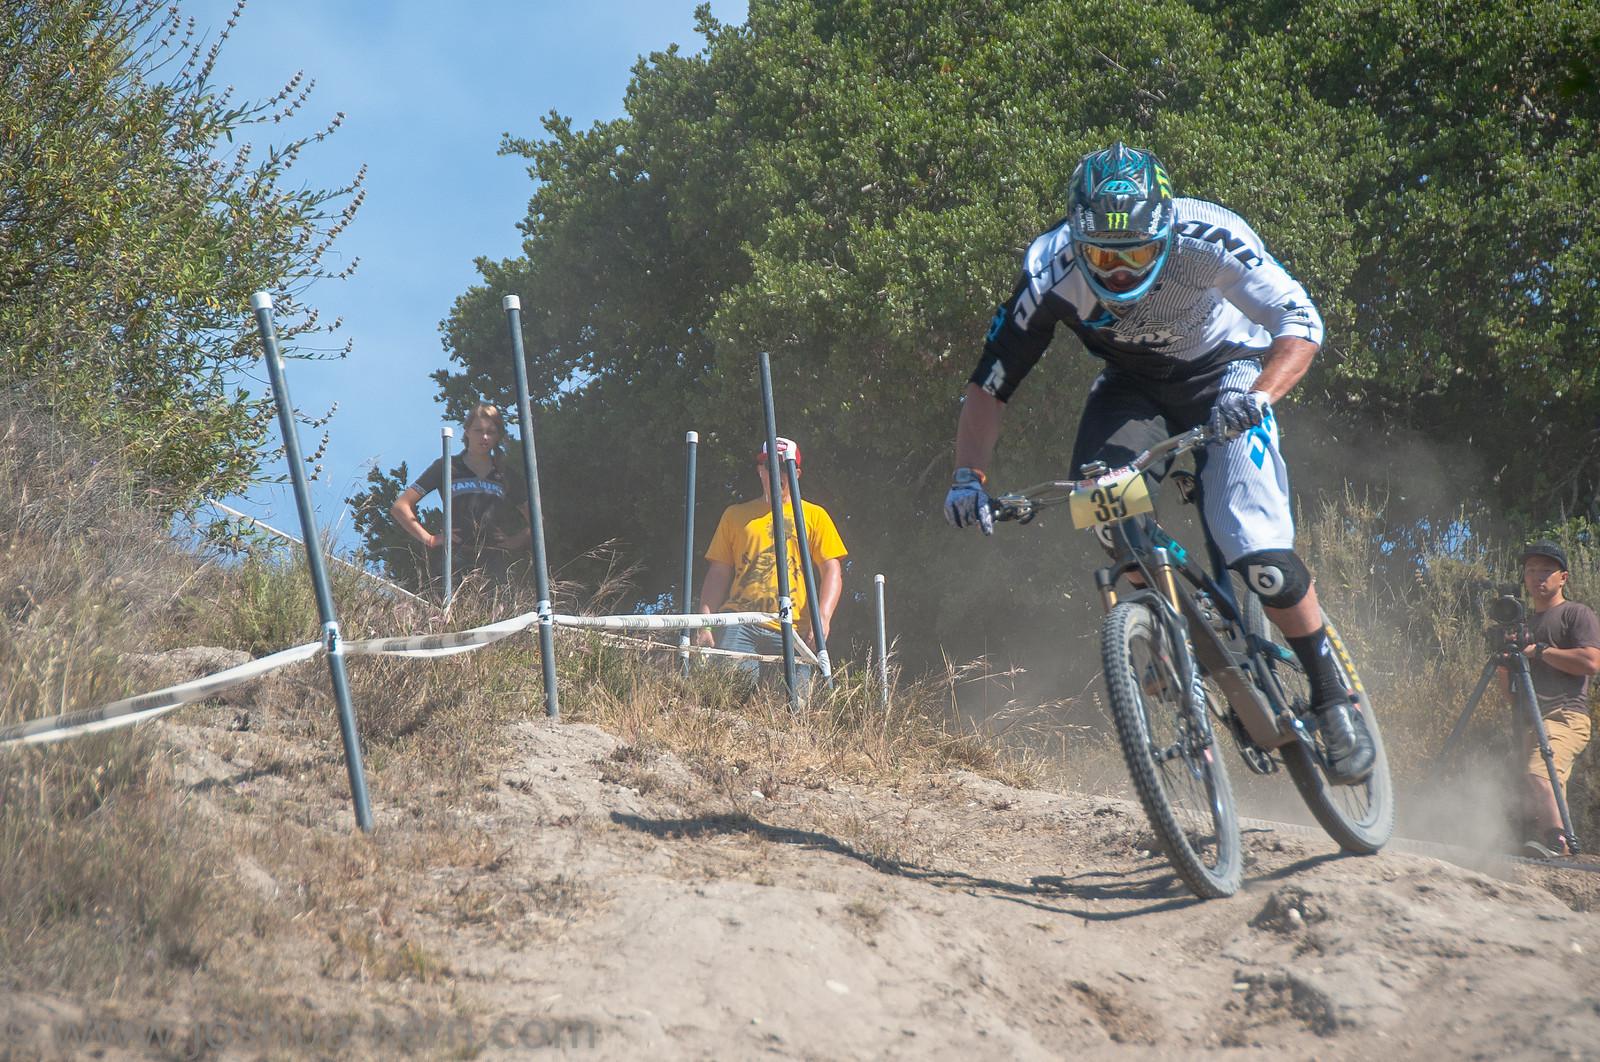 4-19-13DHPractice (34 of 36) - jkern620 - Mountain Biking Pictures - Vital MTB